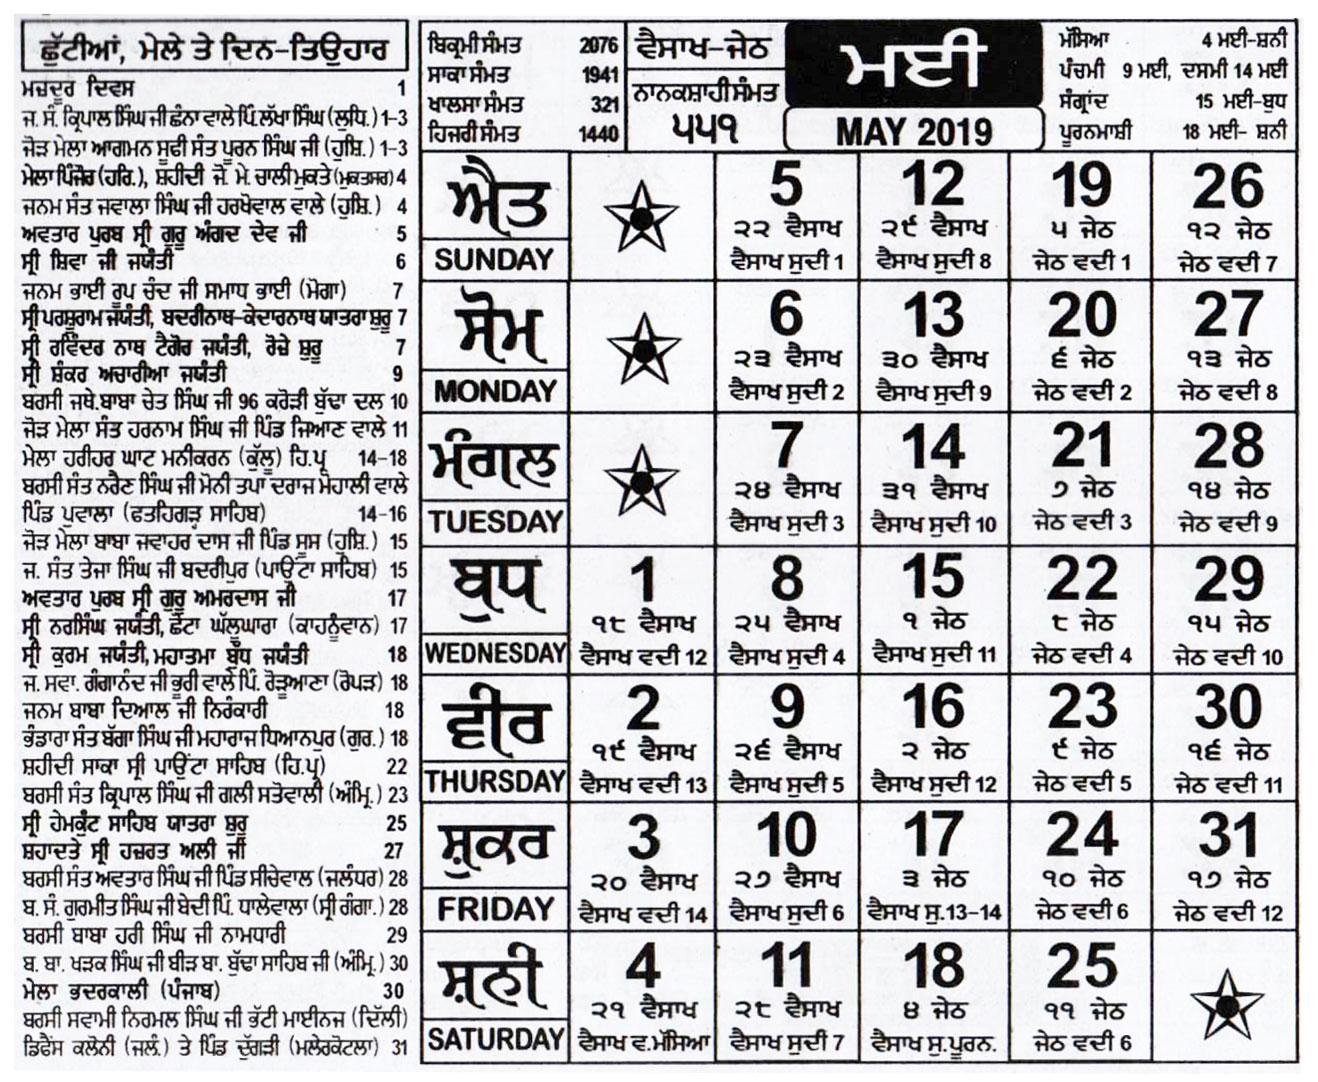 Khalsa Heera Jantri 2019  Nitnem Path pertaining to Khalsa Heera Jantri 2020 Pdf Download